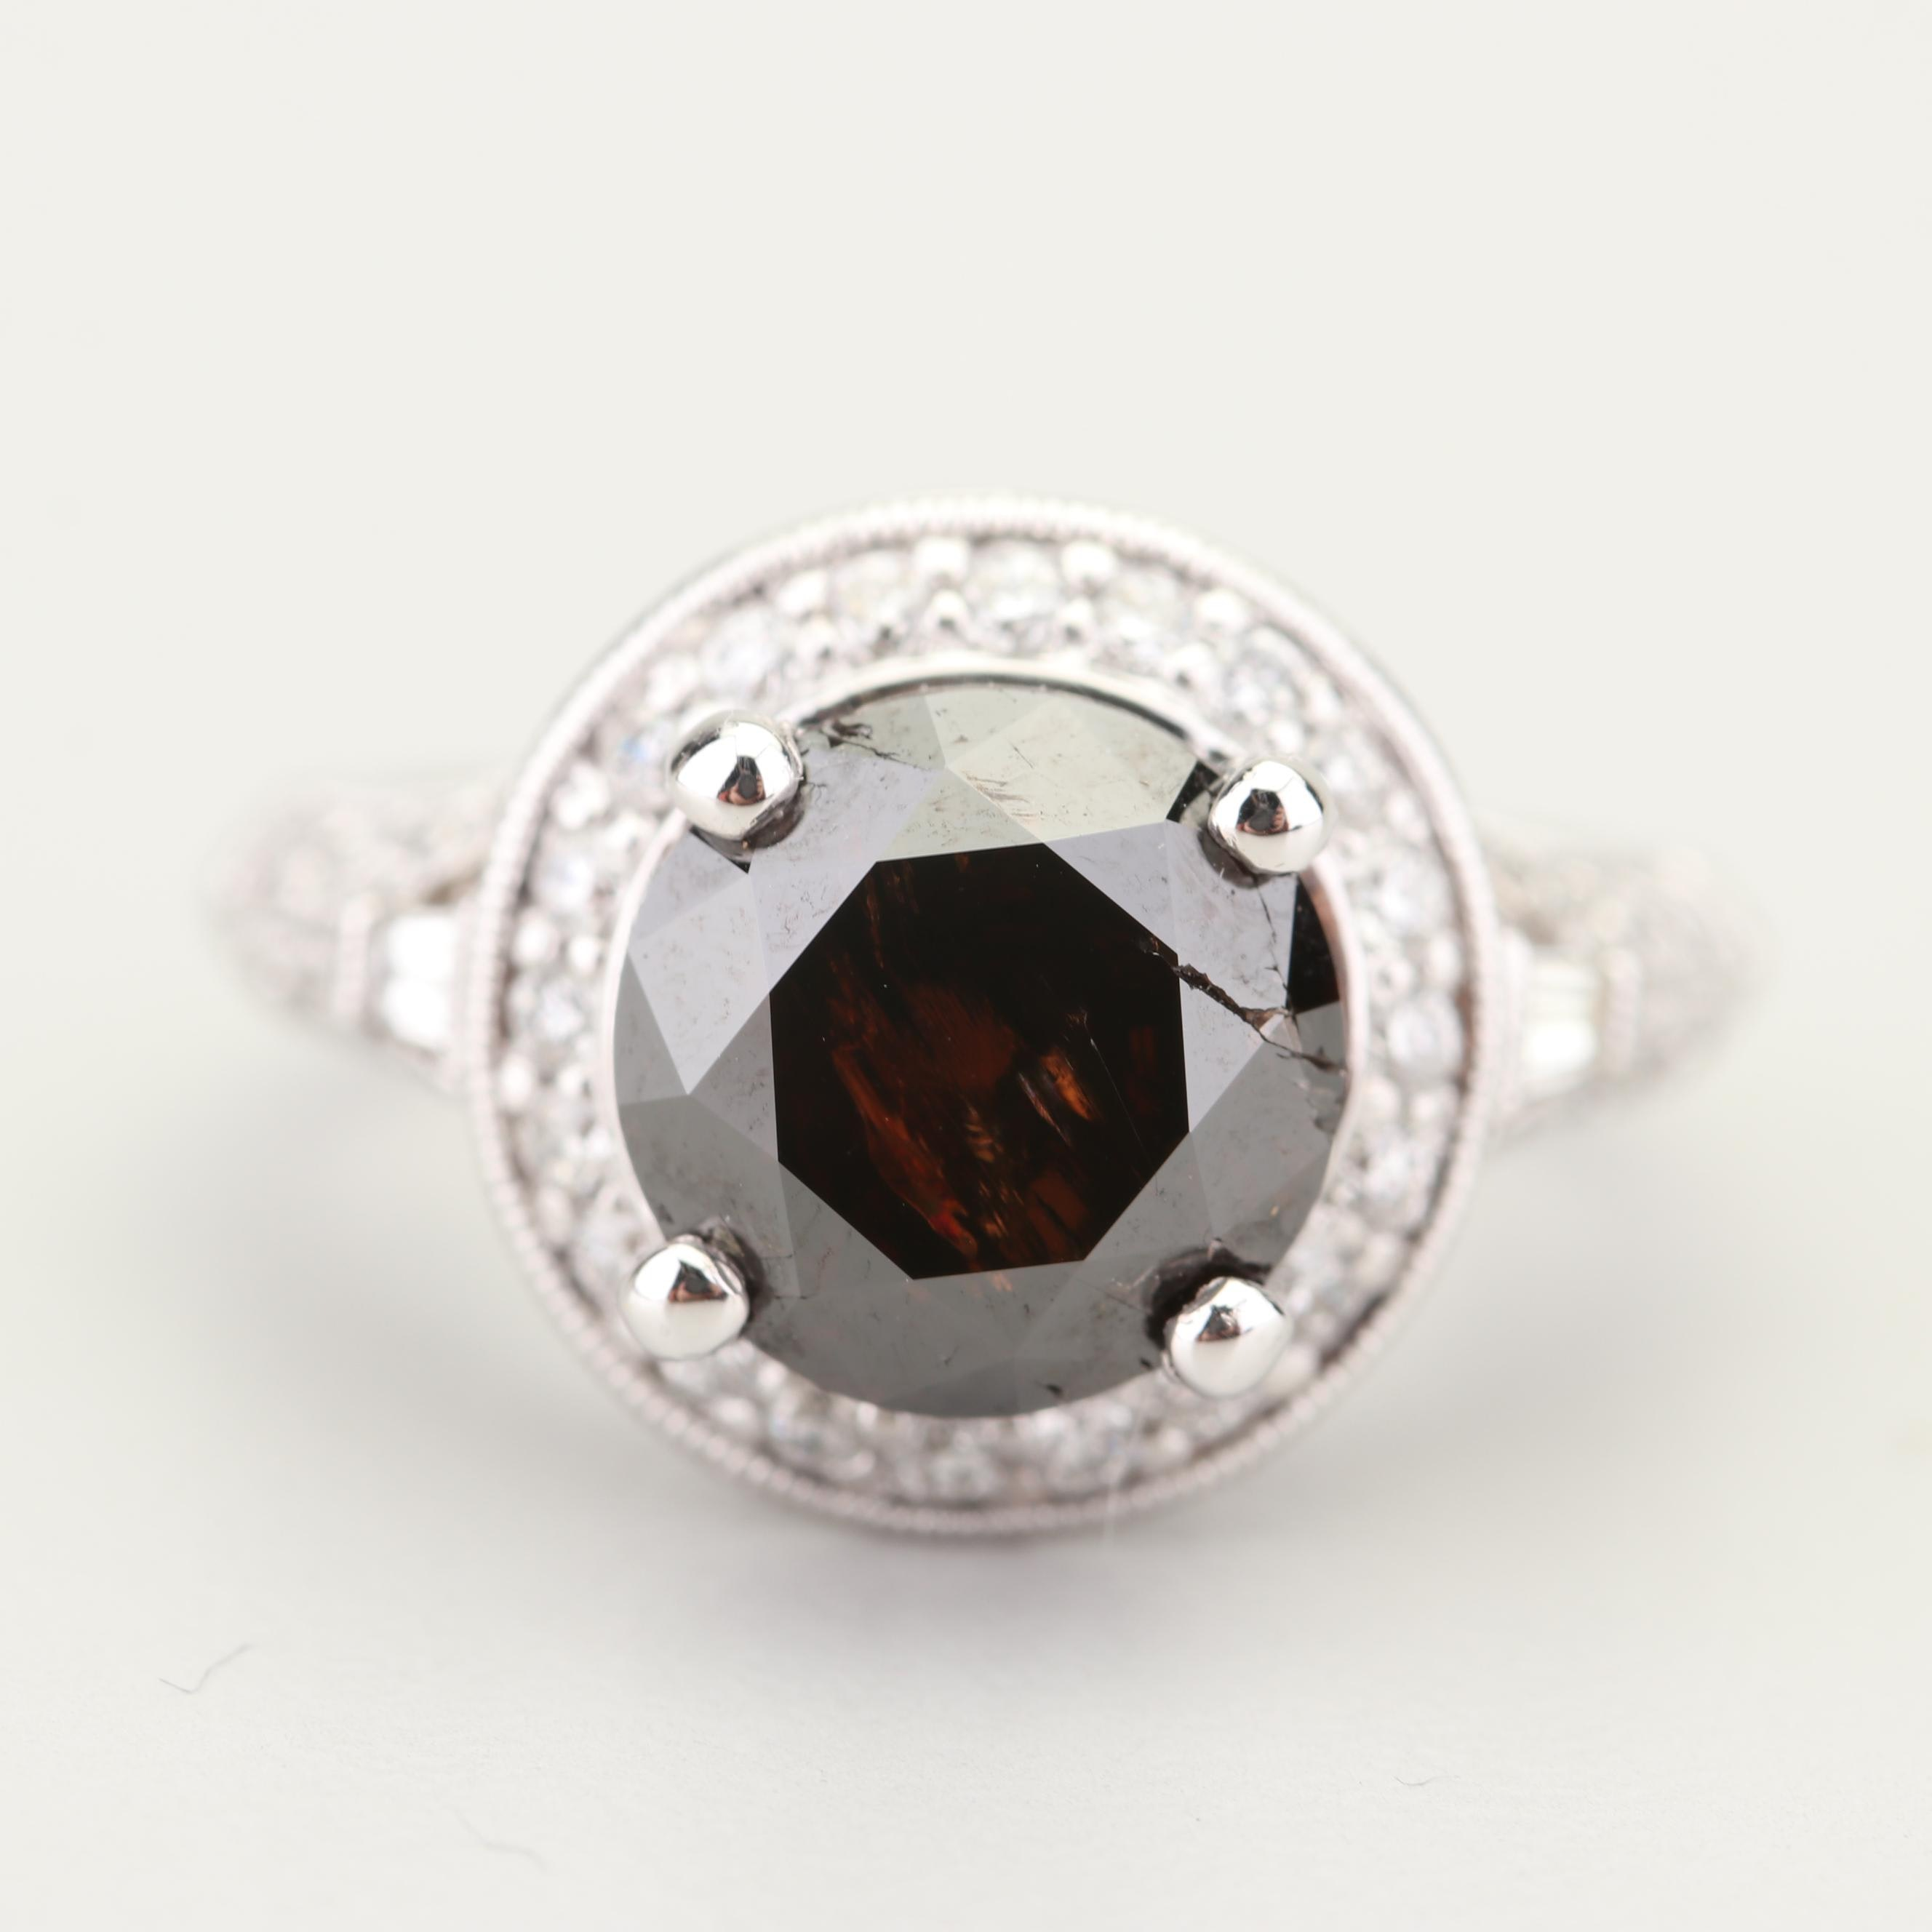 Parade 18K White Gold 3.27 CT Reddish Brown Diamond and Diamond Ring